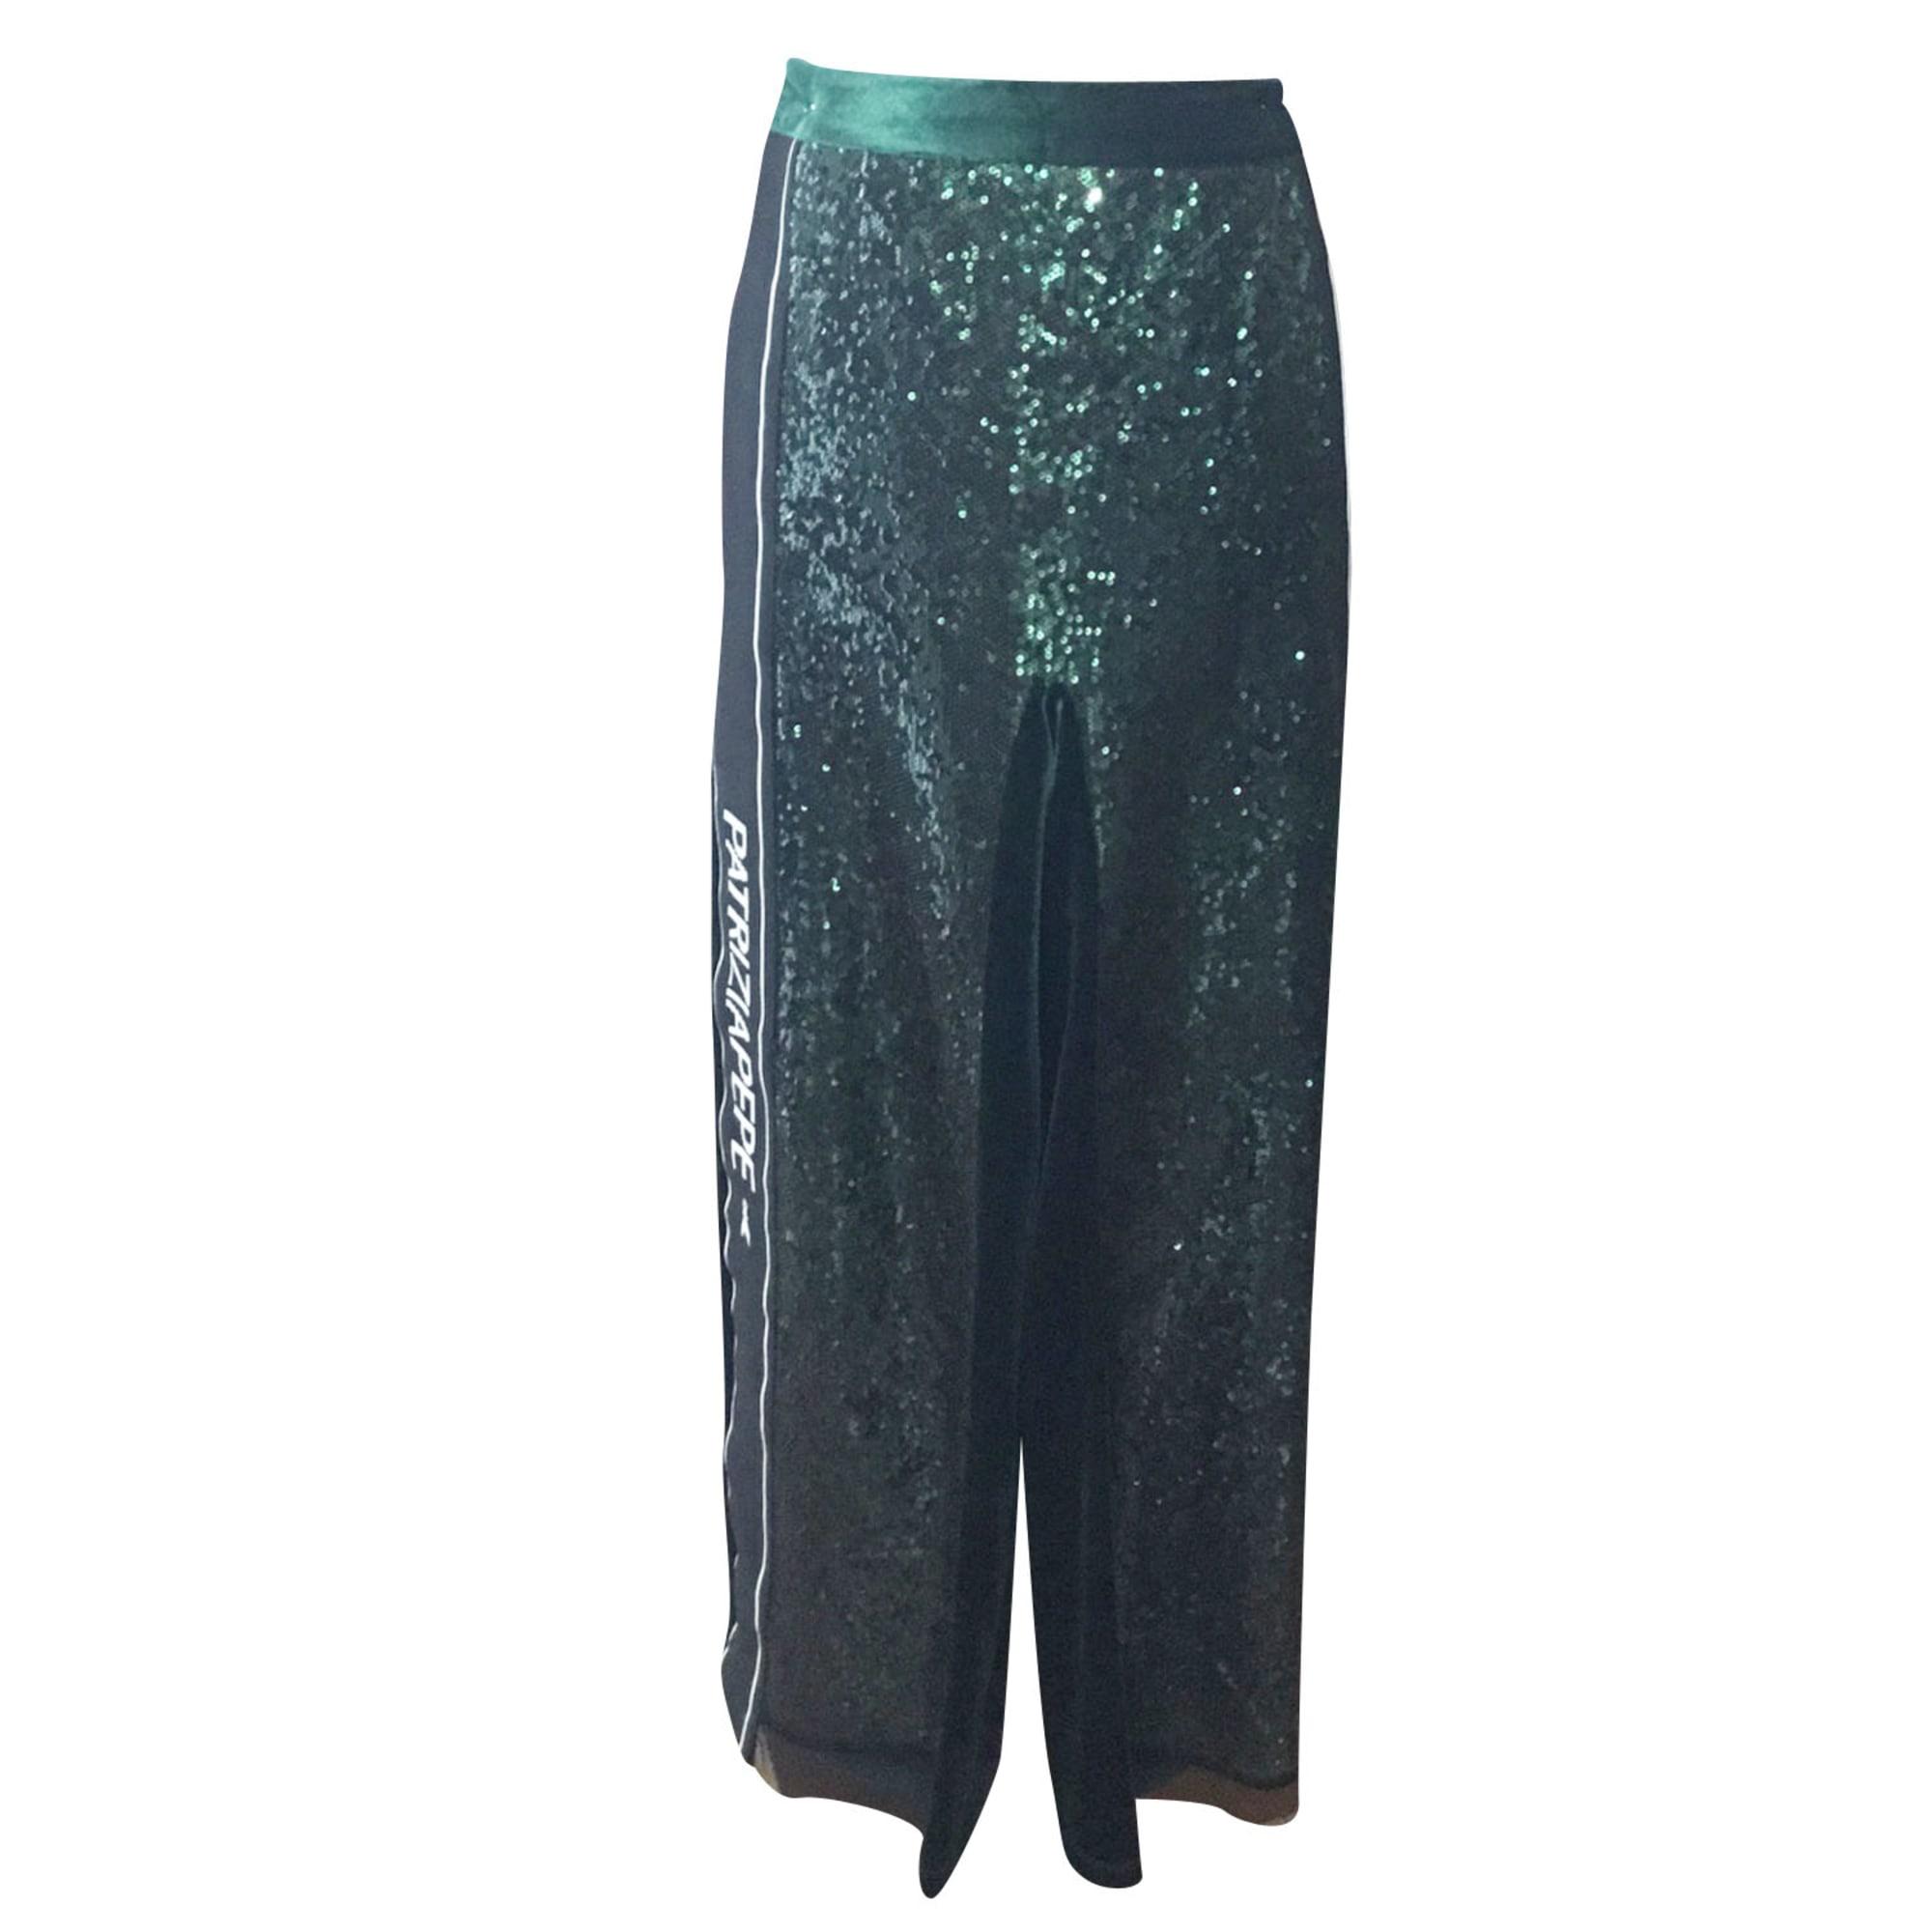 Pantalon droit PATRIZIA PEPE Vert